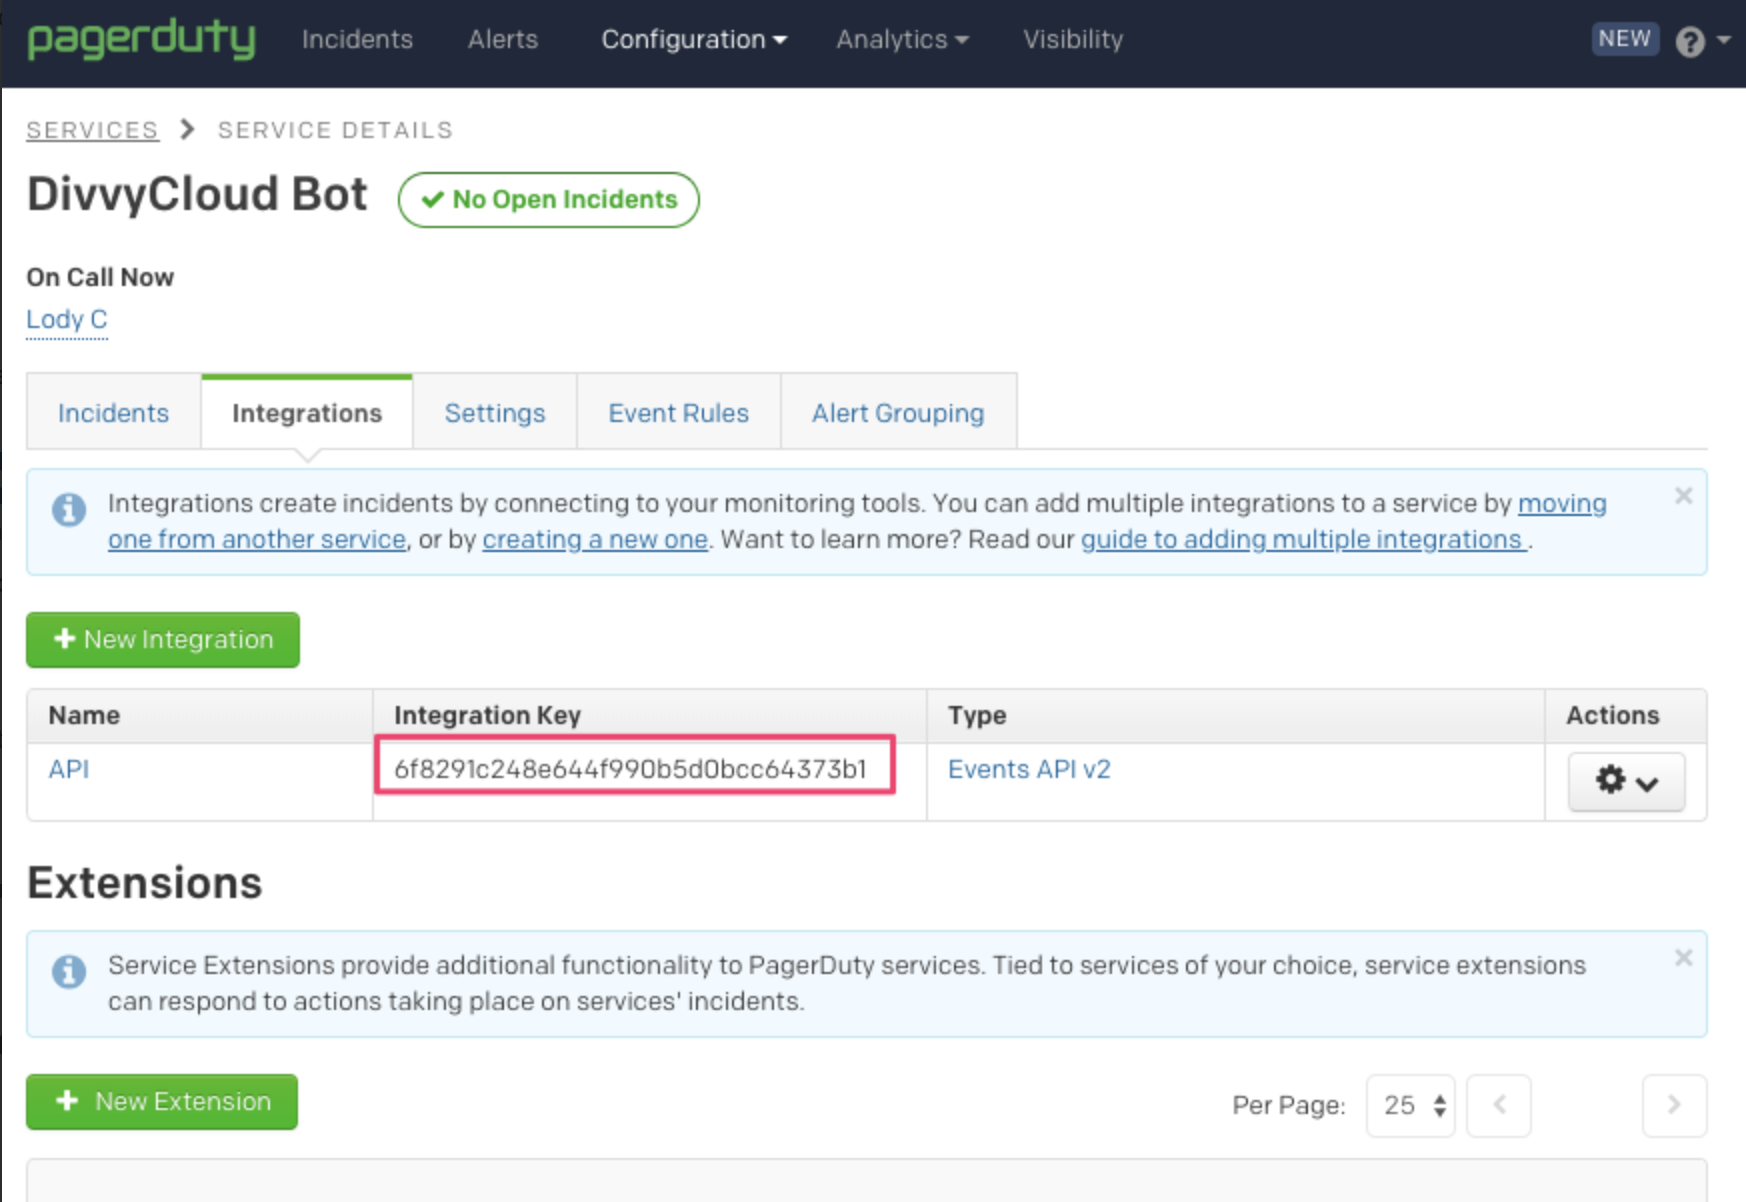 PagerDuty Example Integration Key